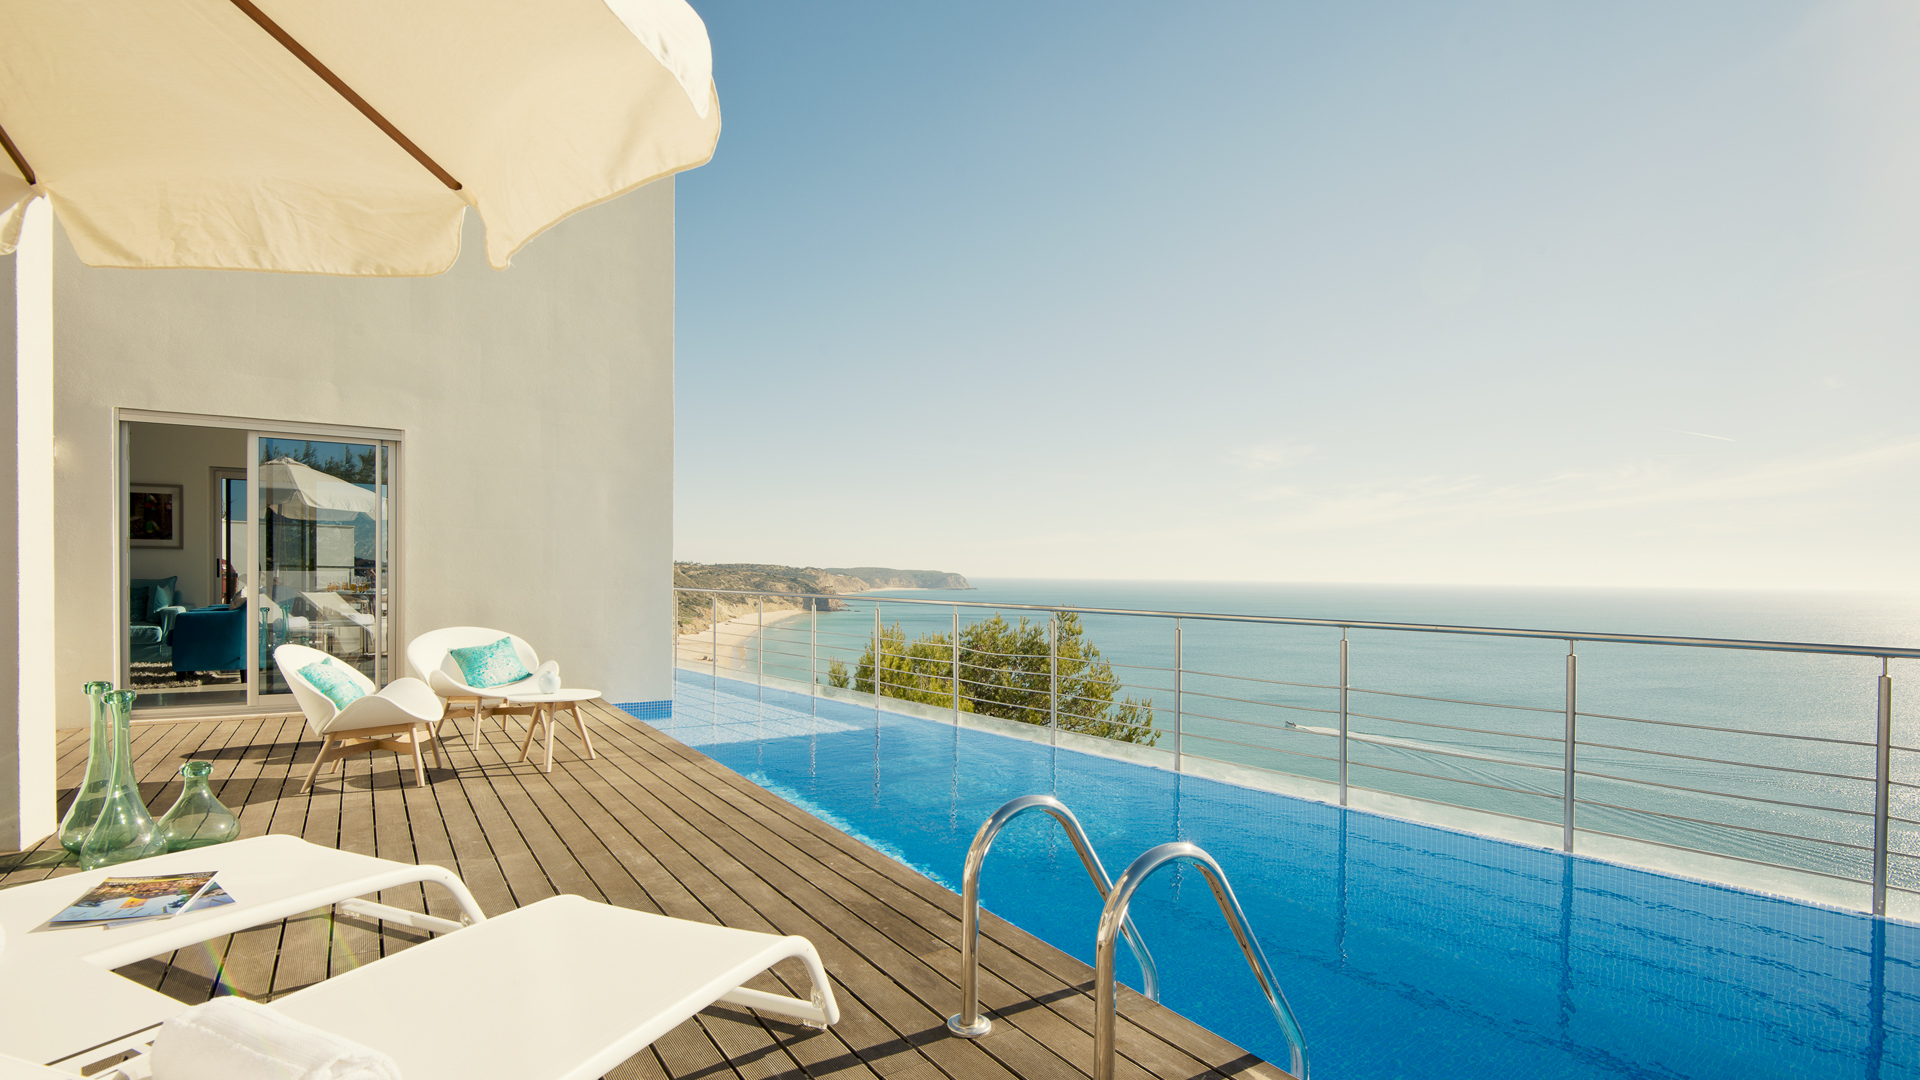 Villa Mar Azul - terrace pool